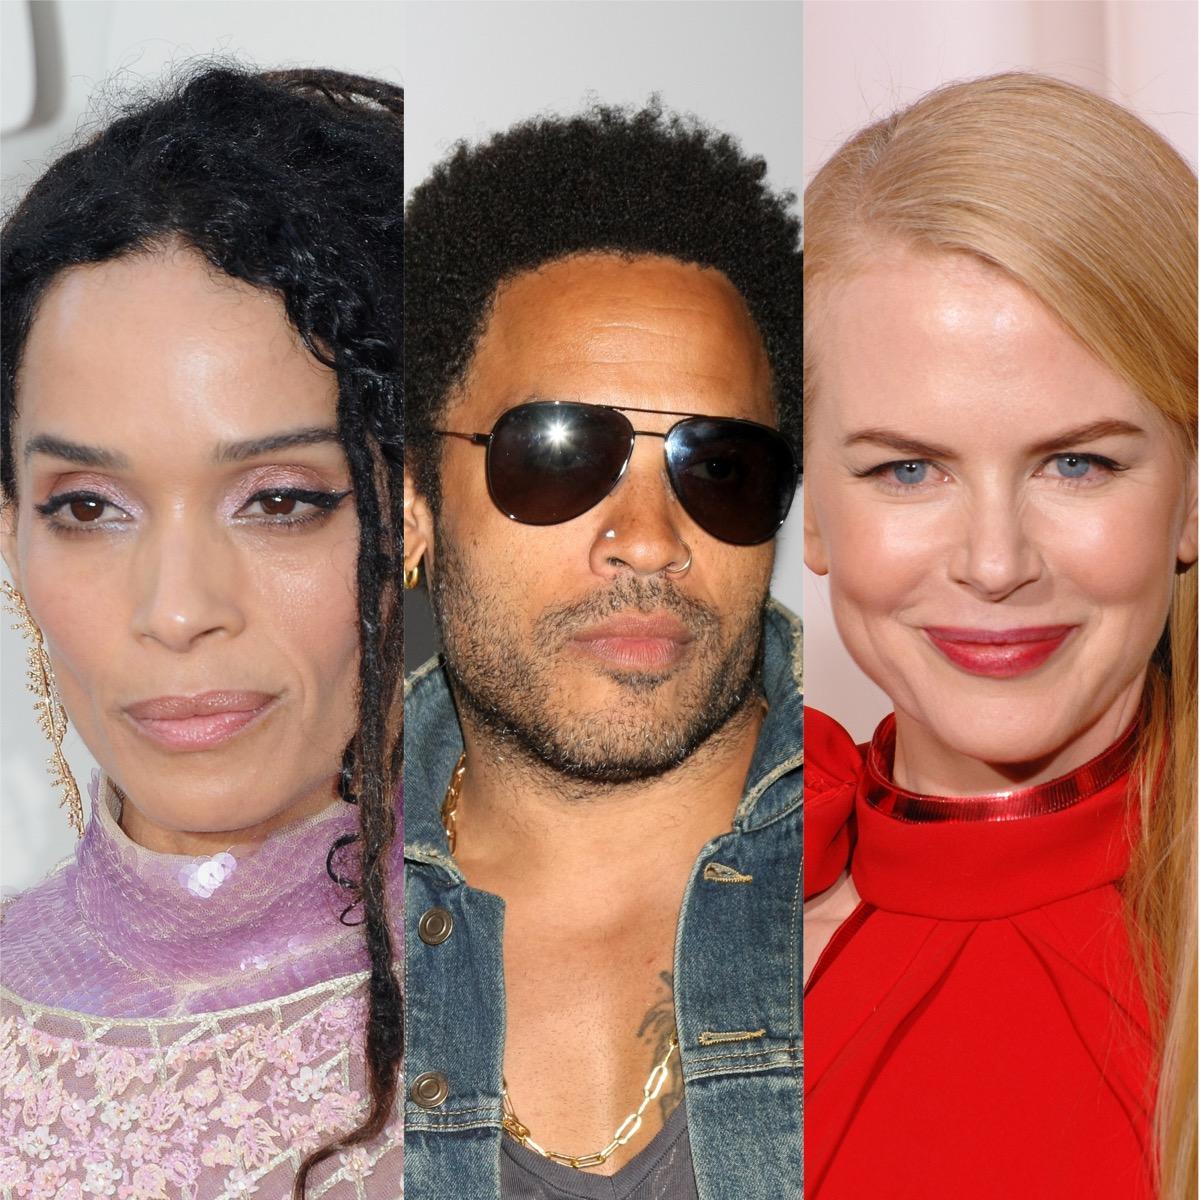 Lisa Bonet, Lenny Kravitz, and Nicole Kidman